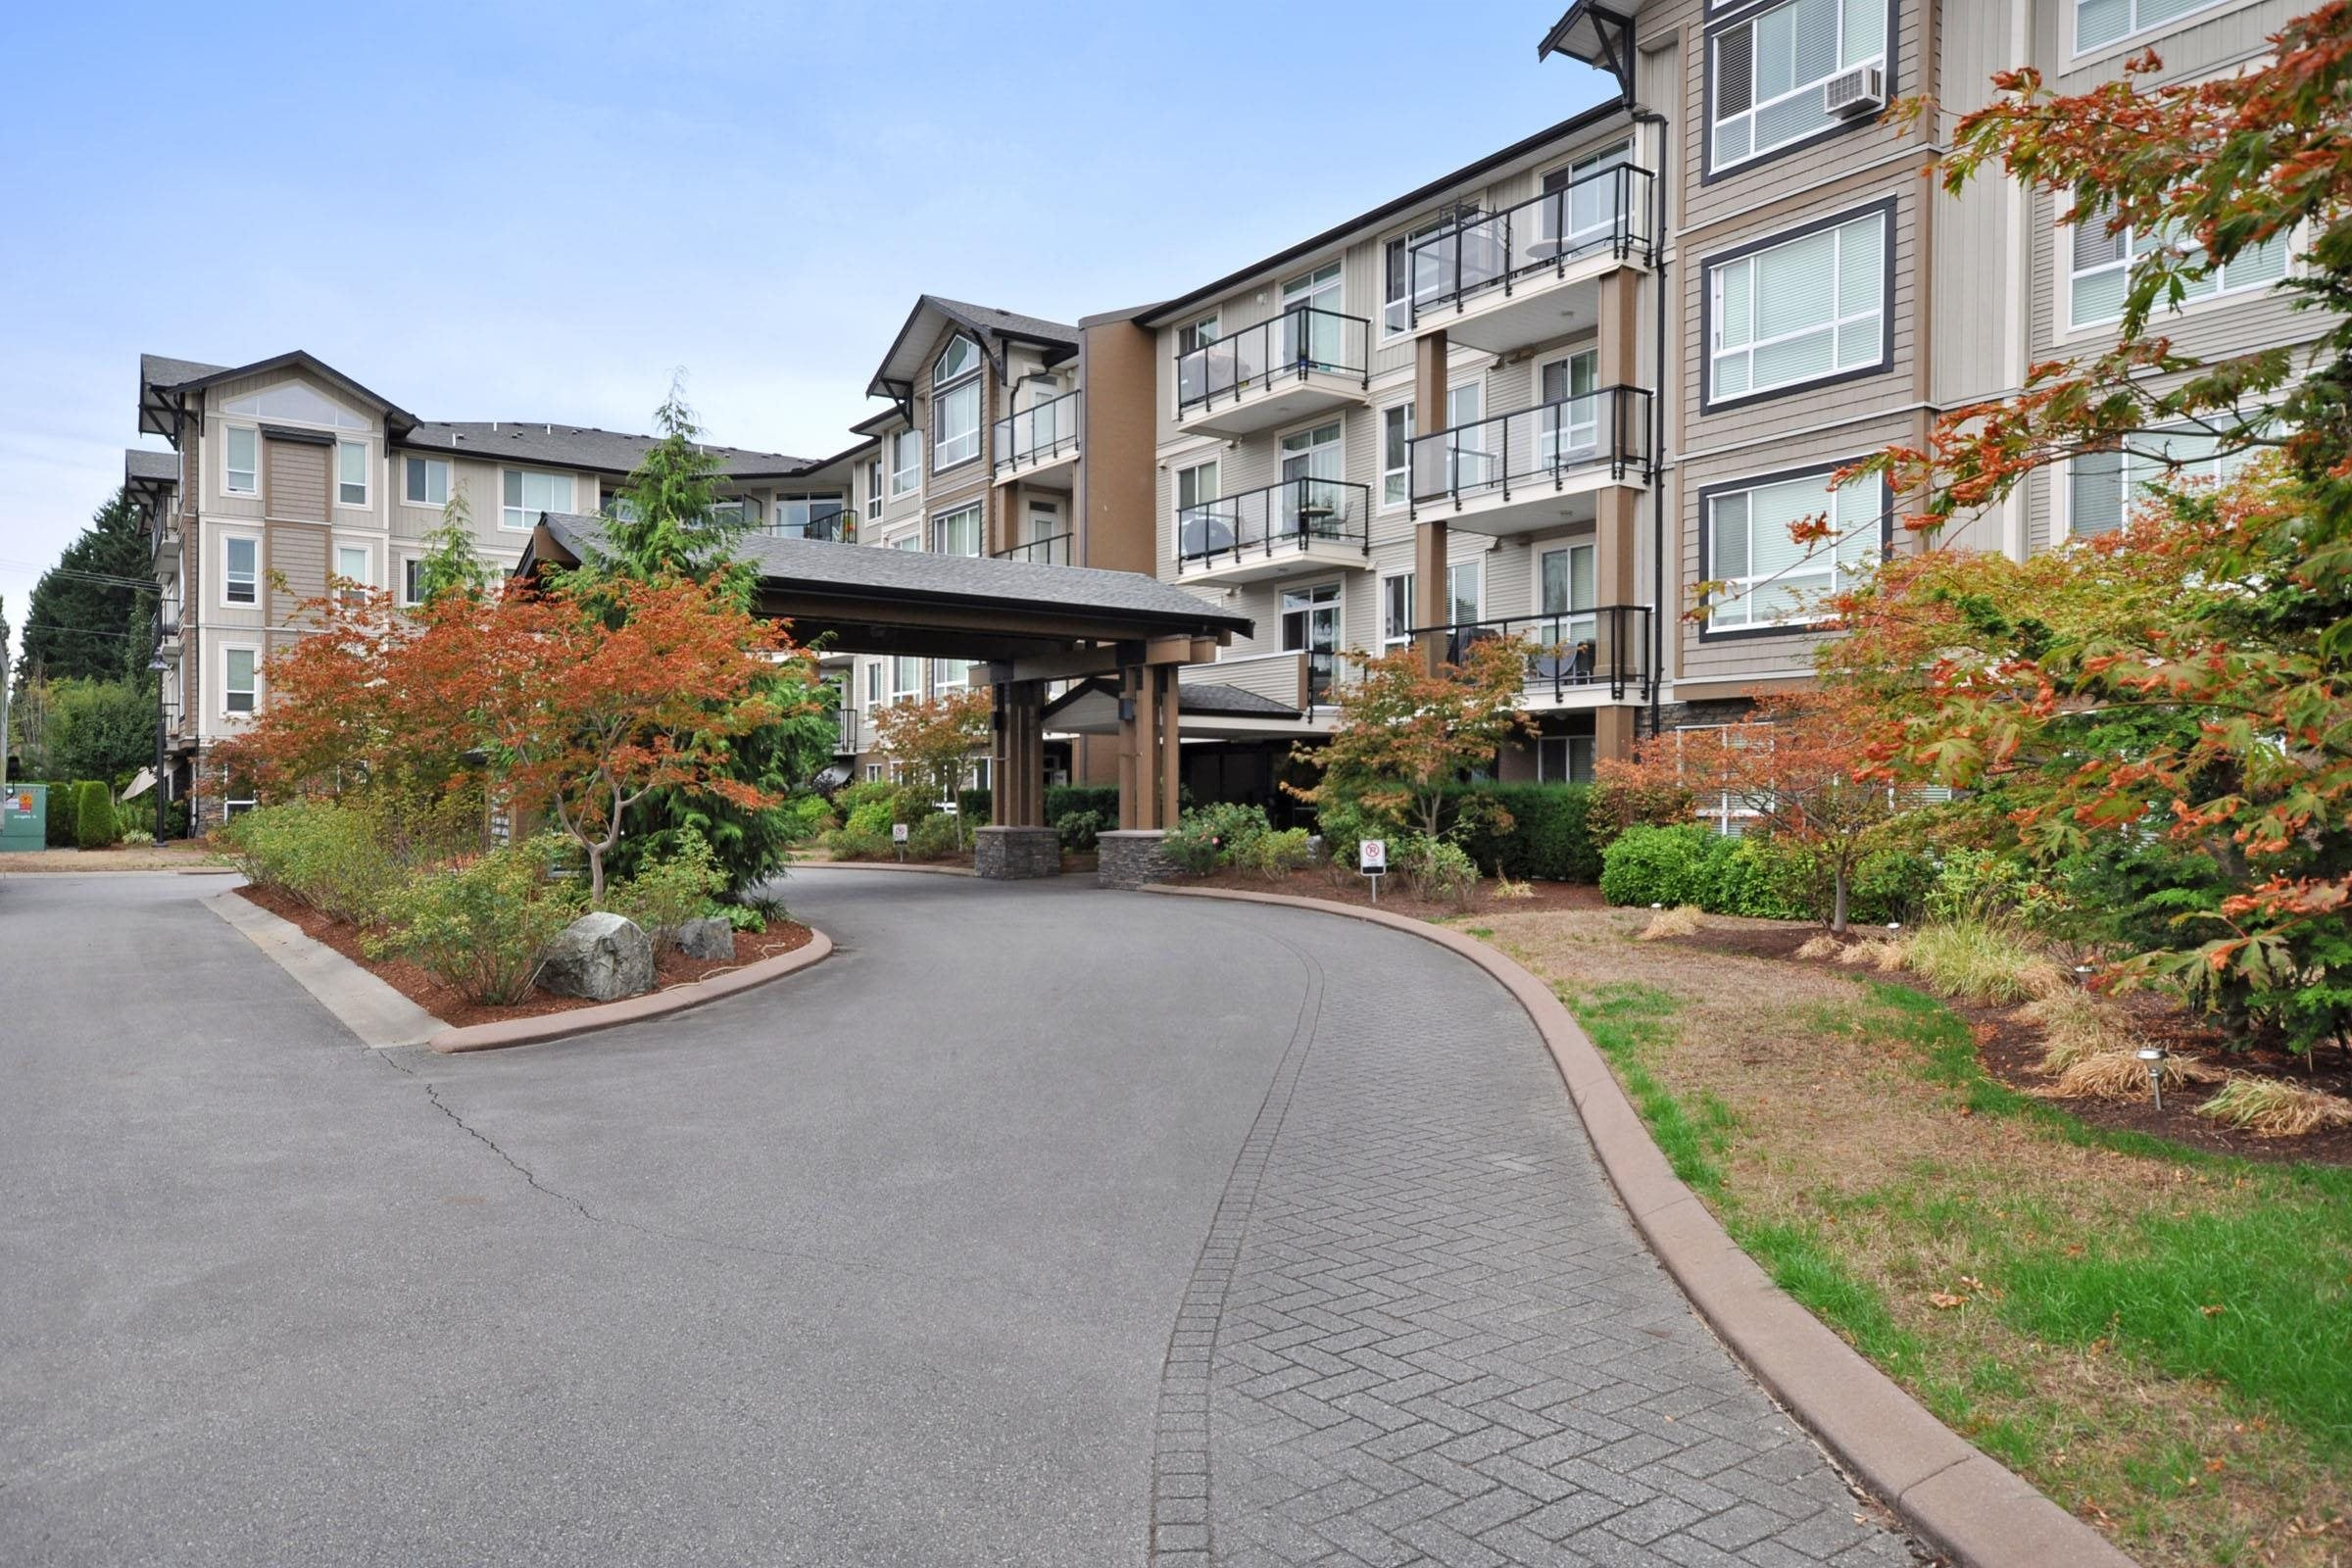 215 32729 GARIBALDI DRIVE - Abbotsford West Apartment/Condo for sale, 2 Bedrooms (R2617228) - #1